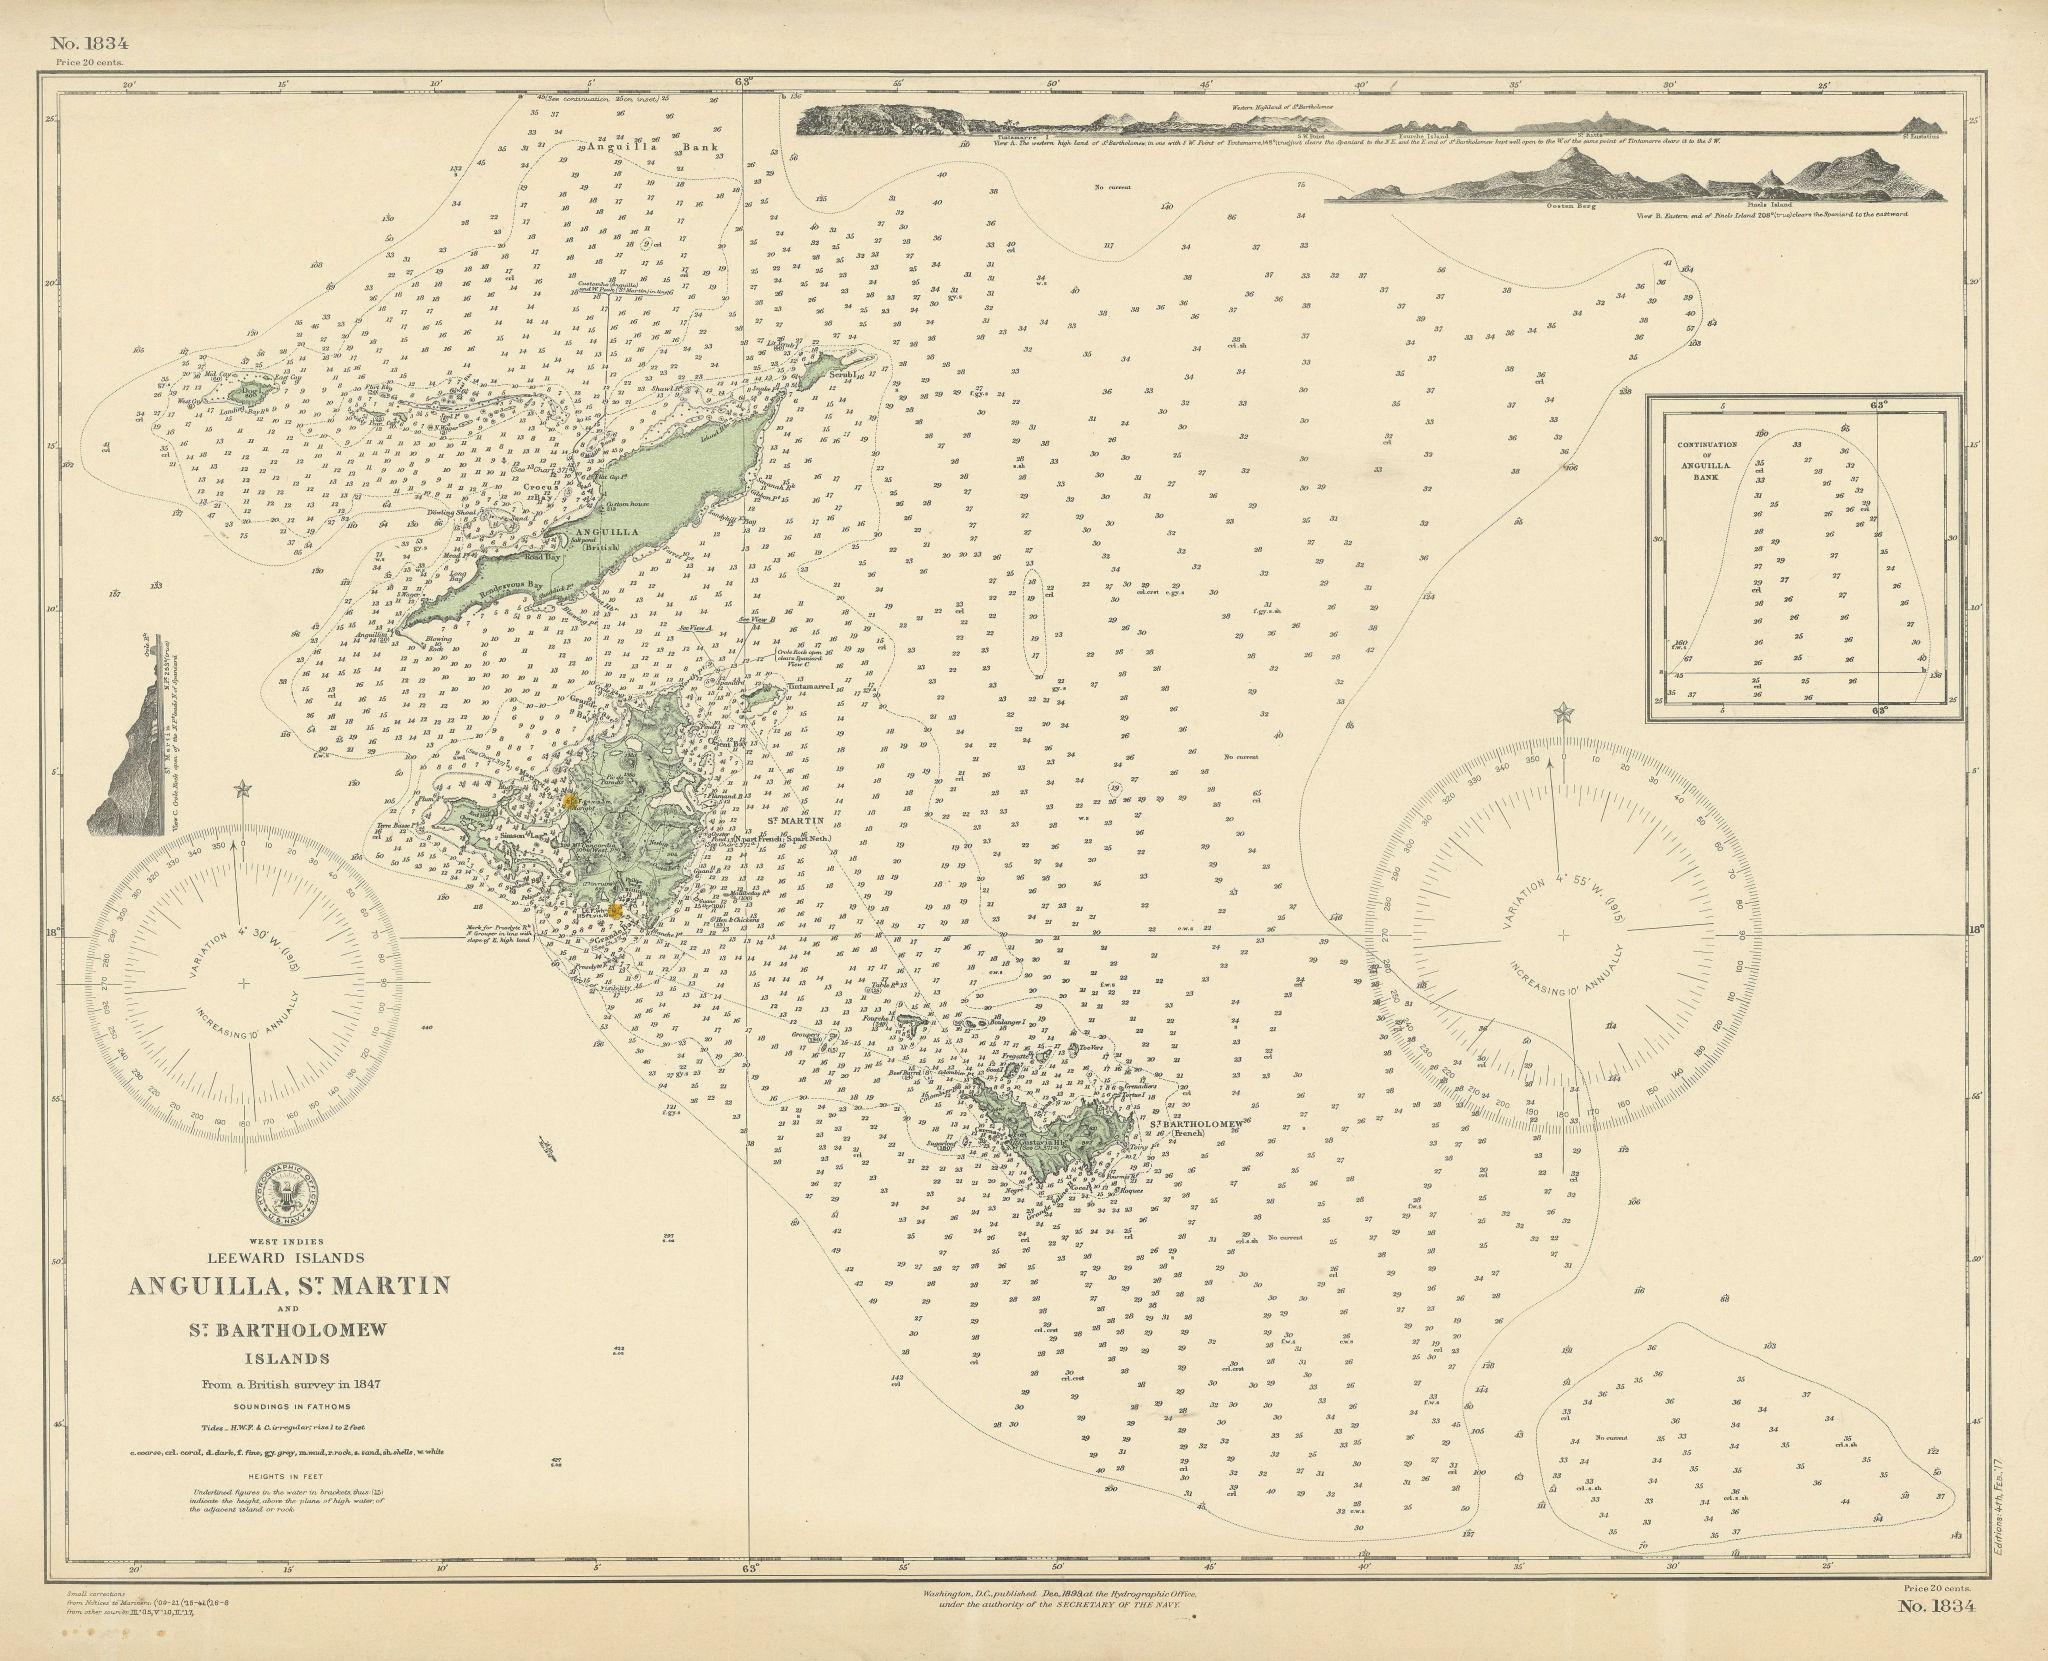 Anguilla St. Martin/Maarten Barts. Caribbean. US Navy sea chart 1899 (1917) map